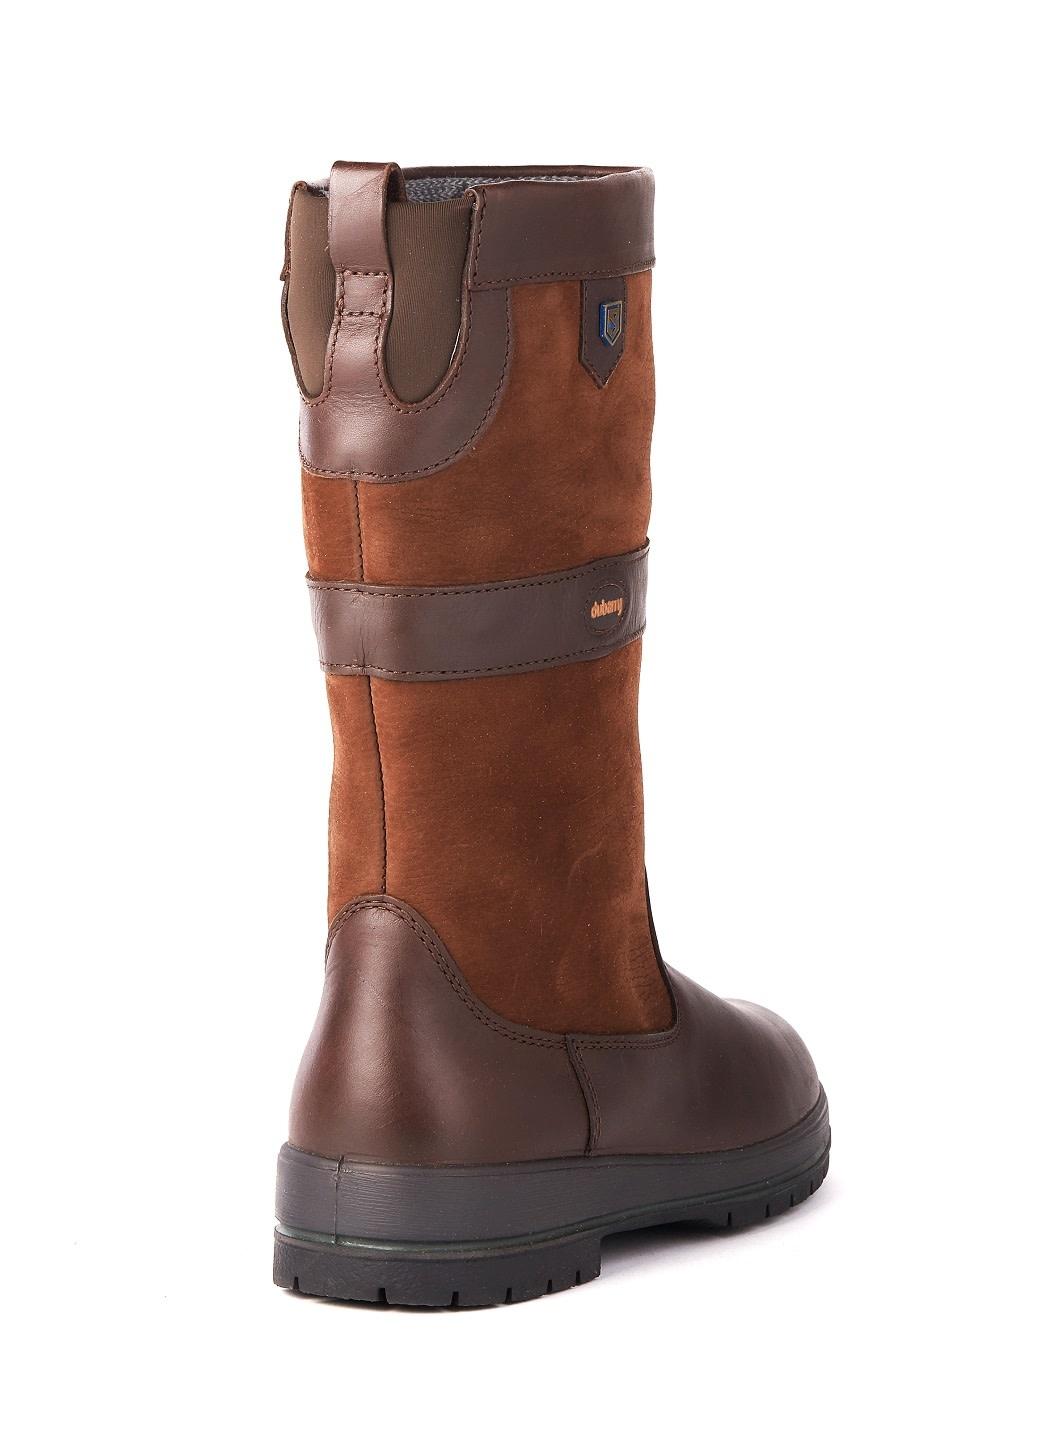 Dubarry Kildare outdoor laarzen - Walnut-2